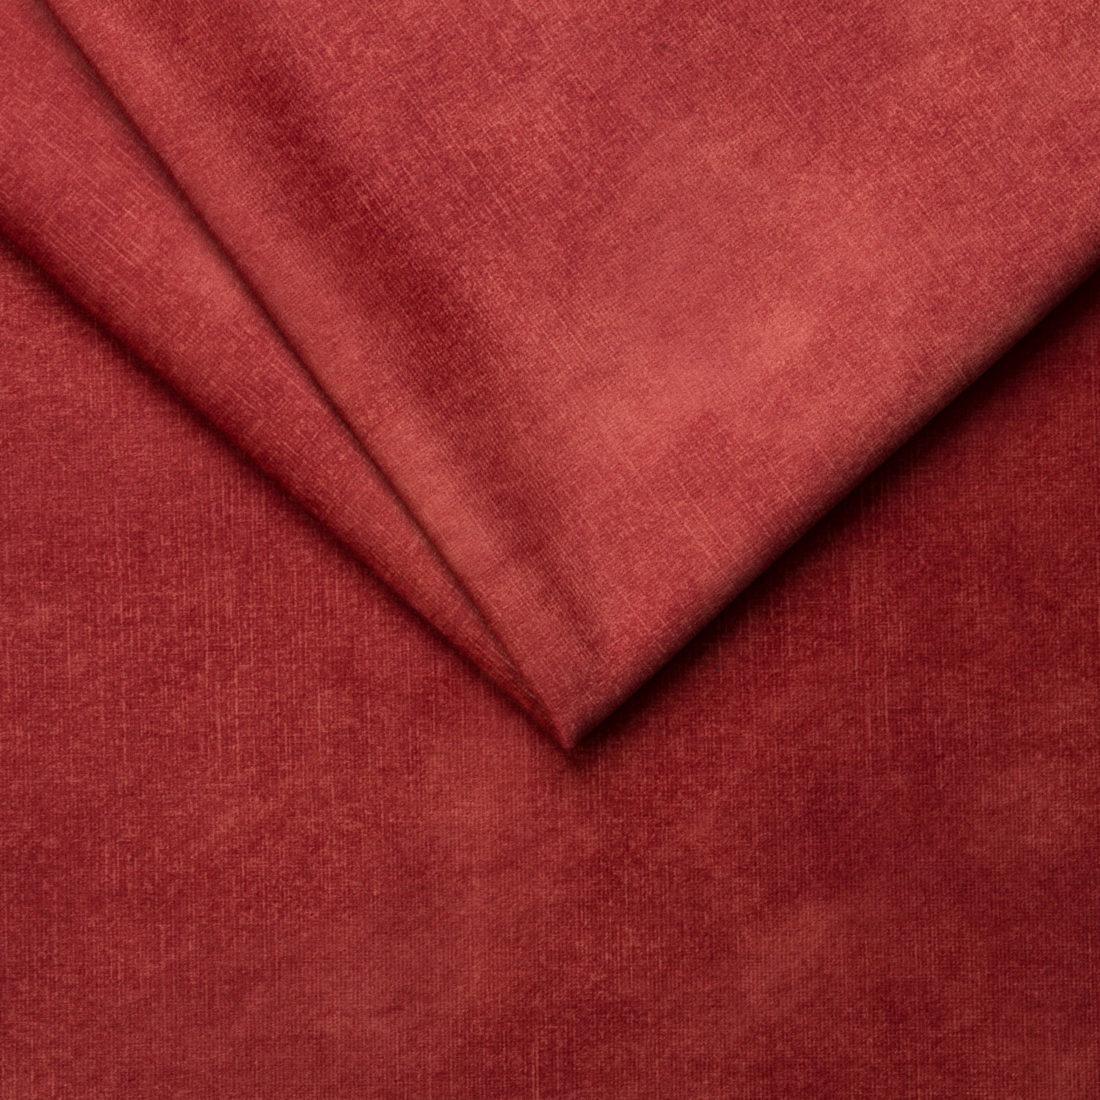 Меблева тканина  Palladium 7 Coral, велюр